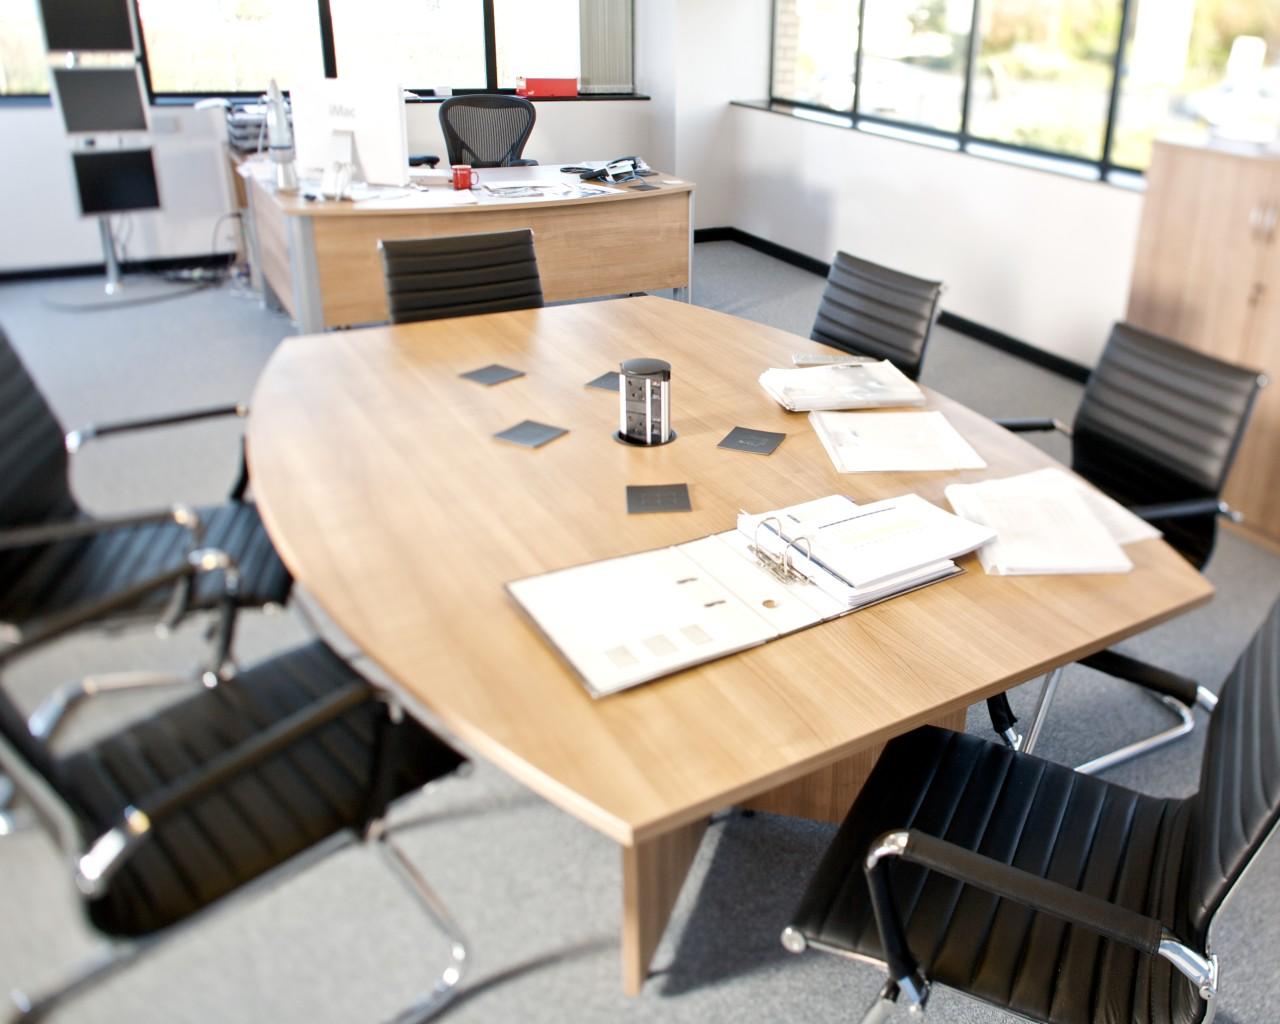 Office refurbishment, Local authority regulations, Bolton, Manchester, Cheshire, Lancashire, Liverpool, Leeds, UK